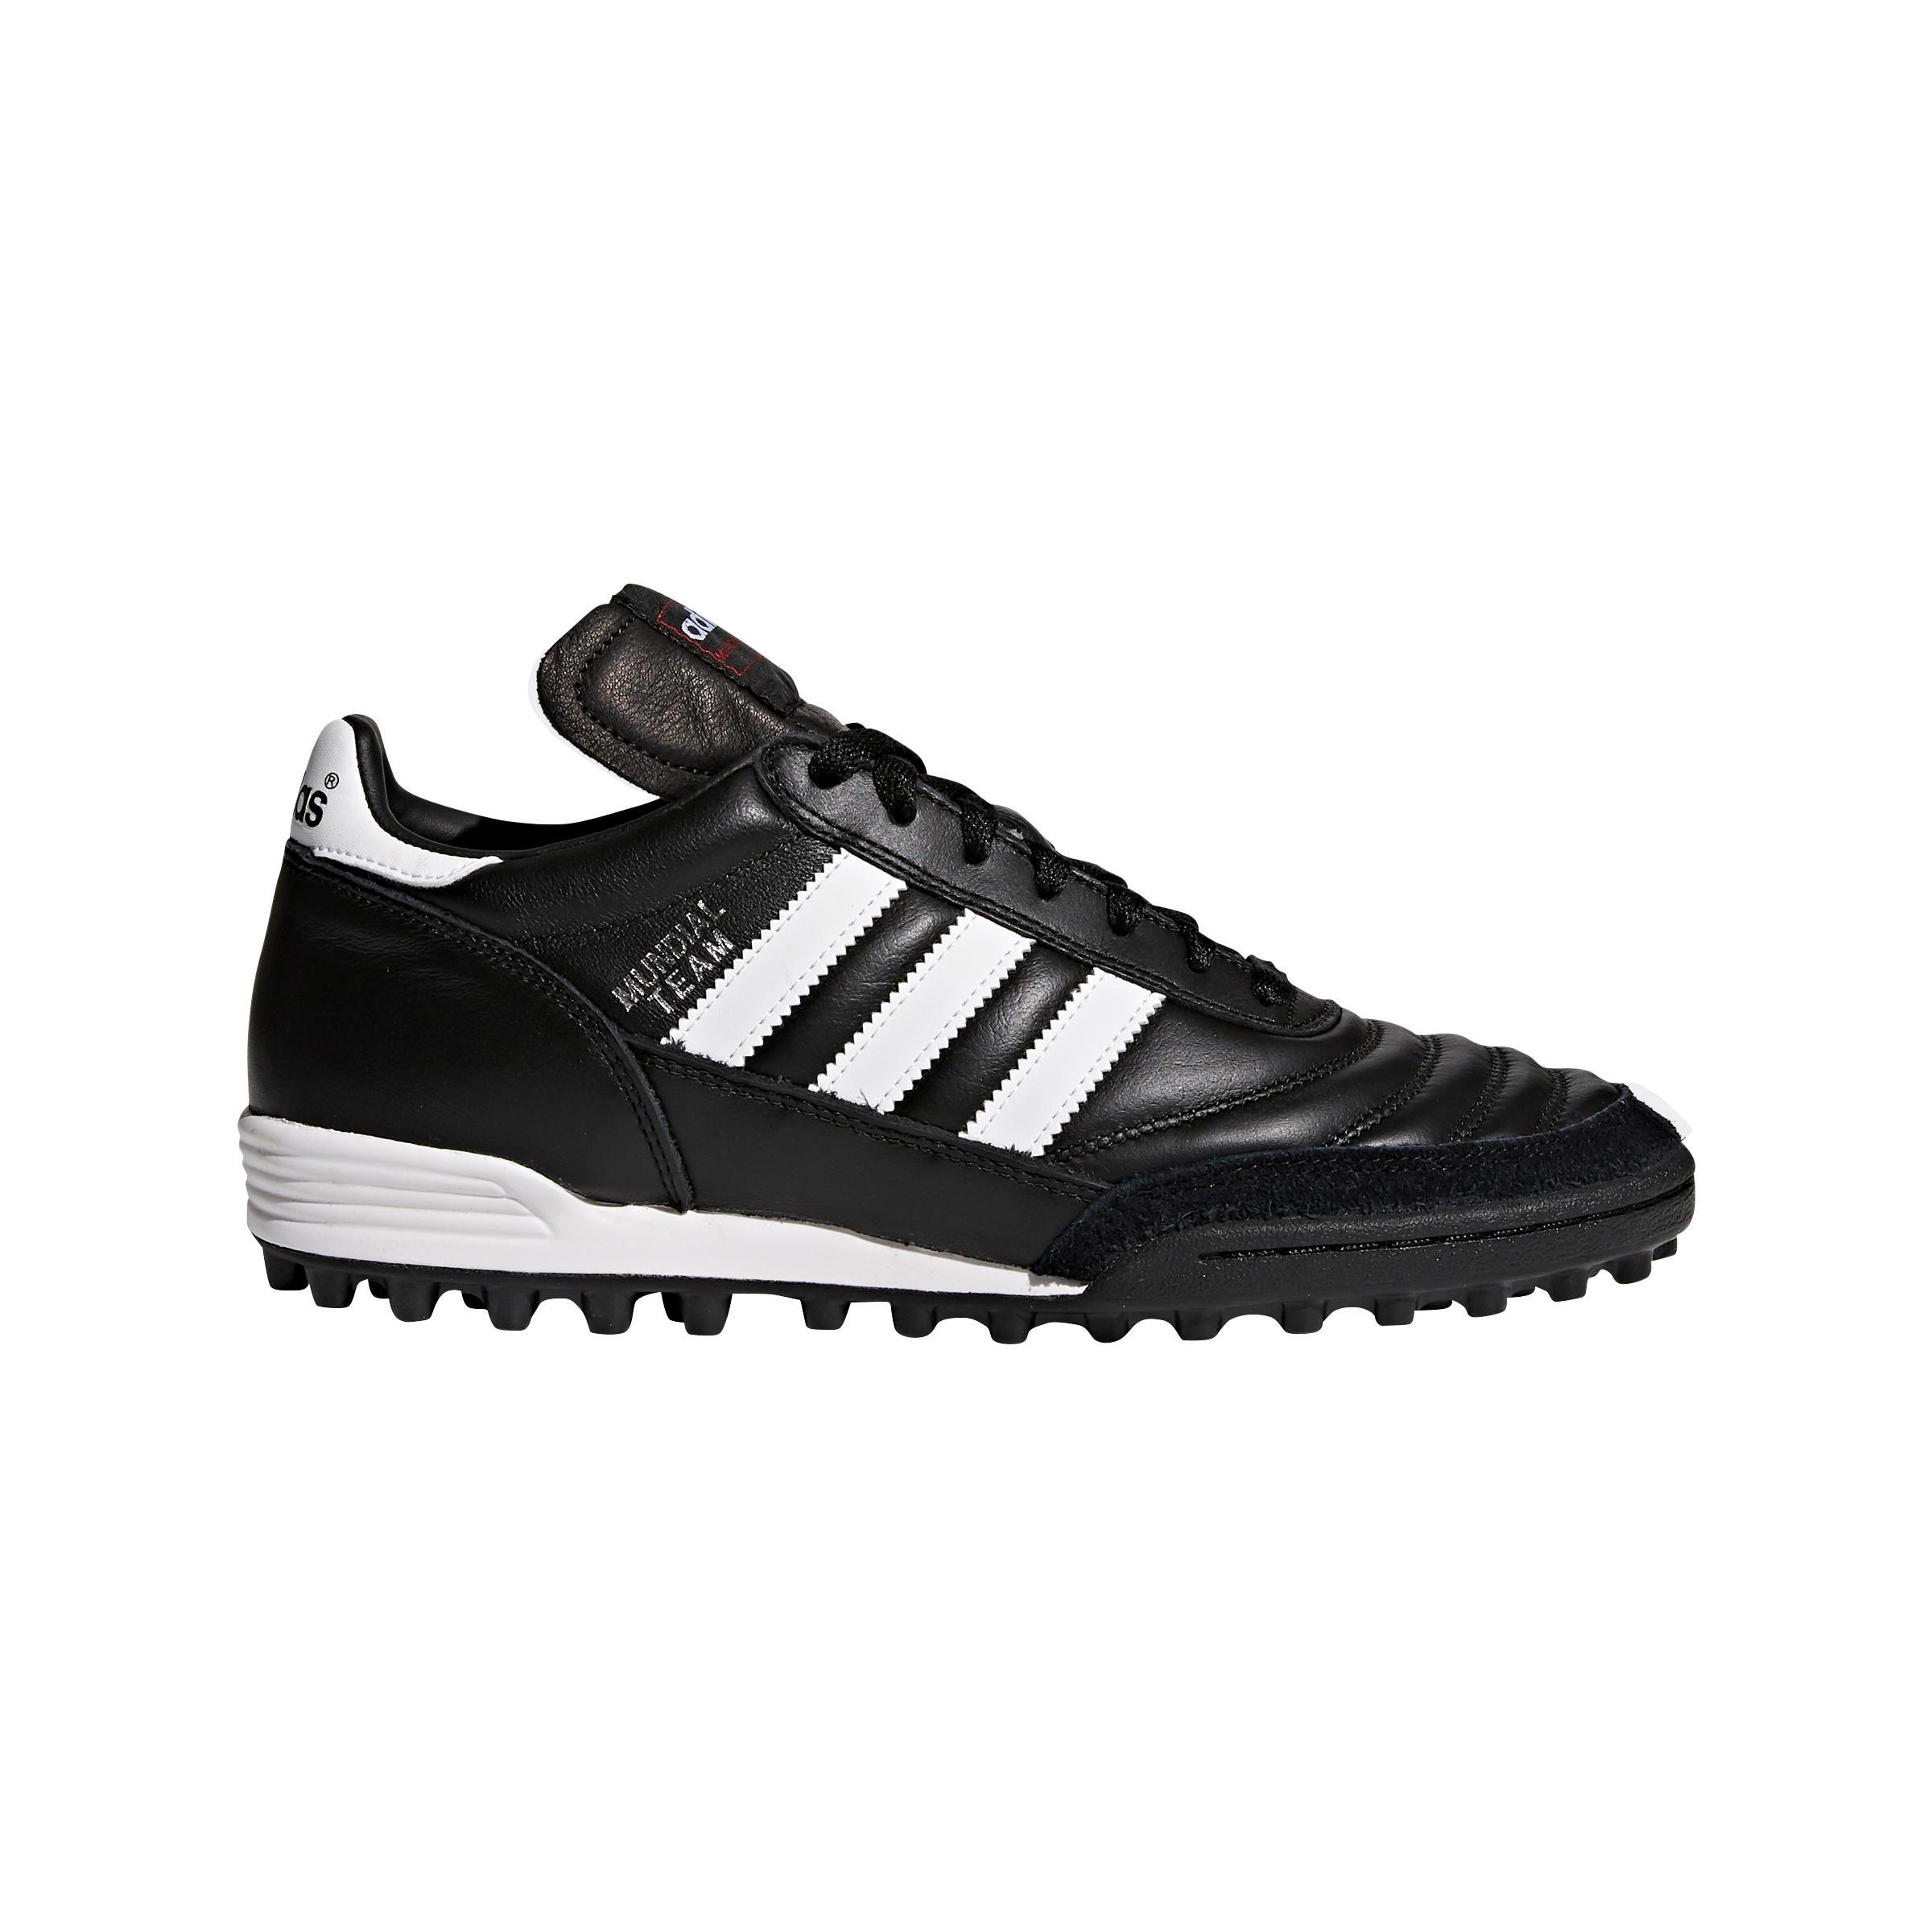 Fußballschuhe Multinocken Mundial Team HG Erwachsene schwarz | Schuhe > Sportschuhe > Fußballschuhe | Adidas